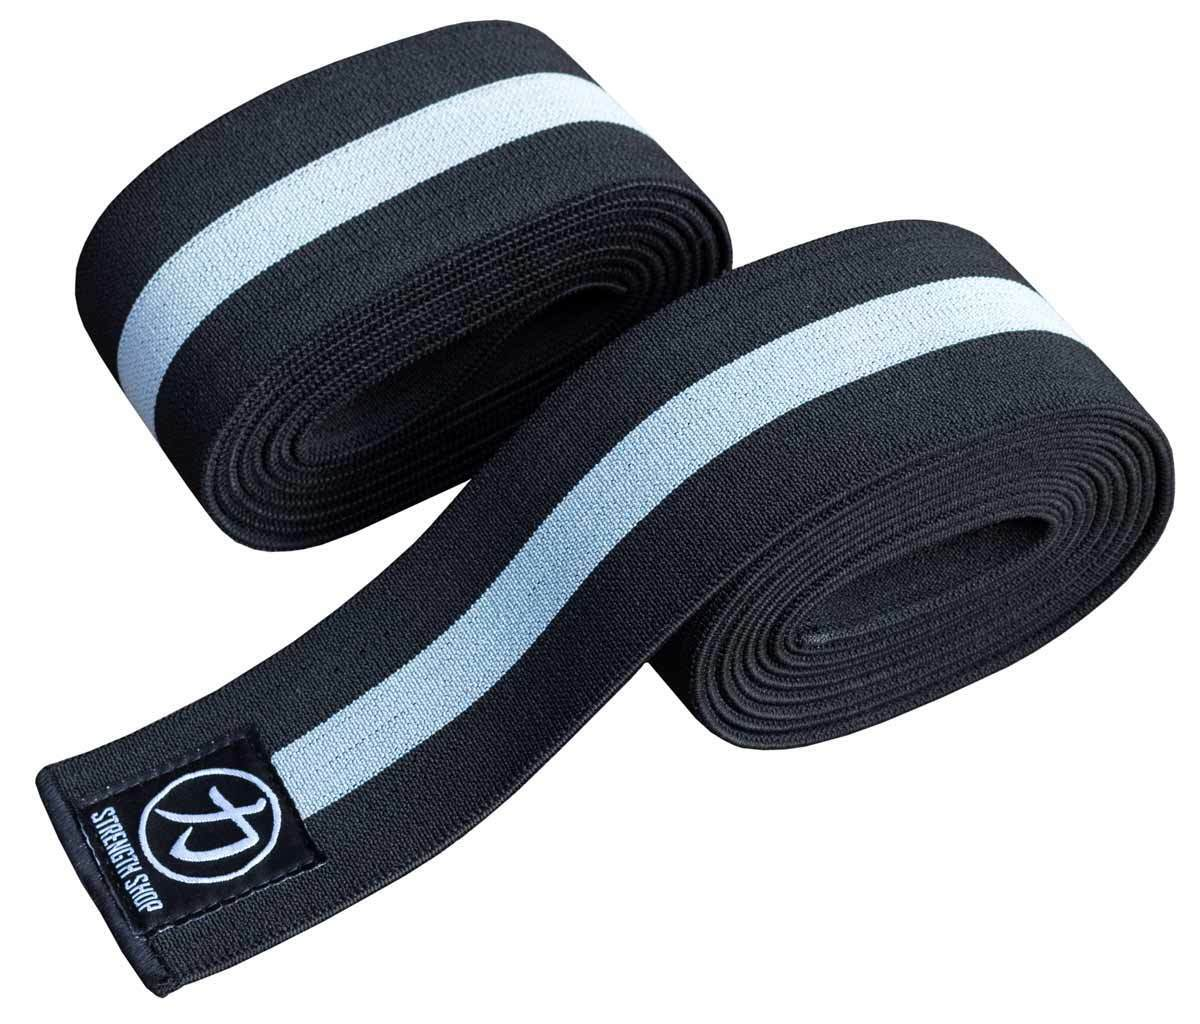 Resistenza SHOP Odin Knee Wraps-SUPER rigida pesante il massimo Powerlifting sostegno Powerlifting massimo 0cdef4